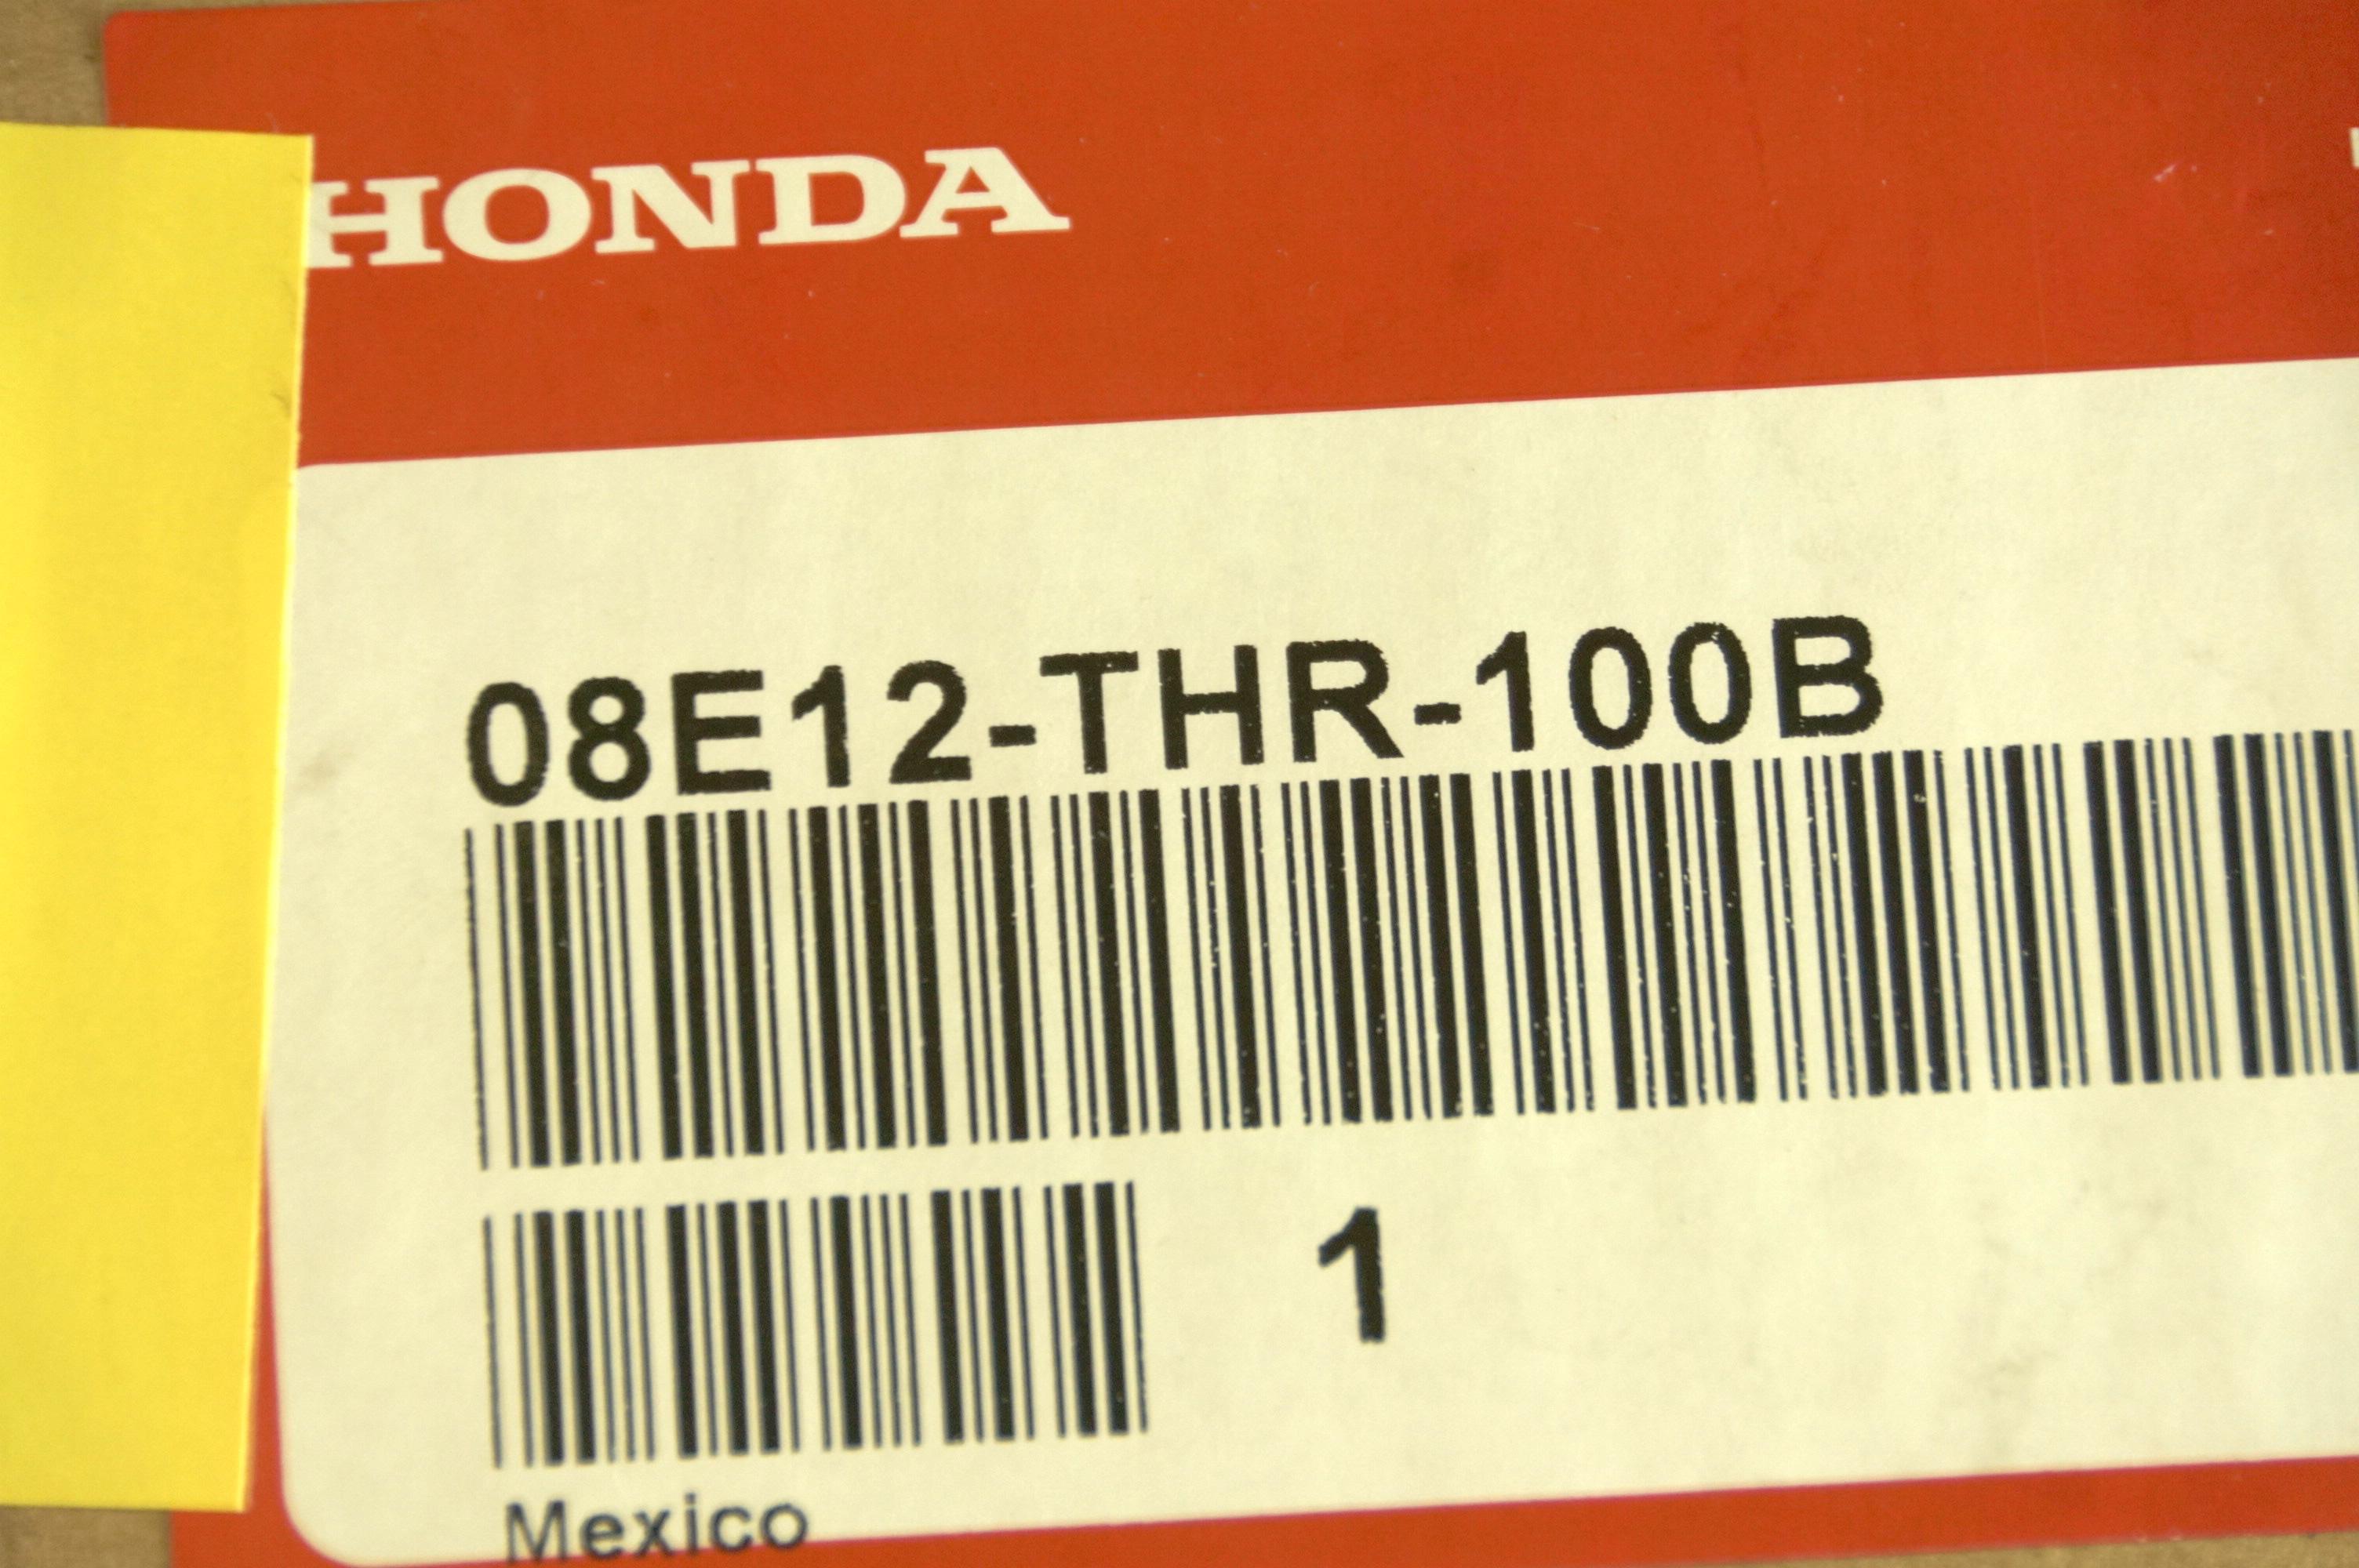 OEM 08E12THR100B Genuine Honda Odyssey 25th Anniversary Illuminated Door Sill - image 7